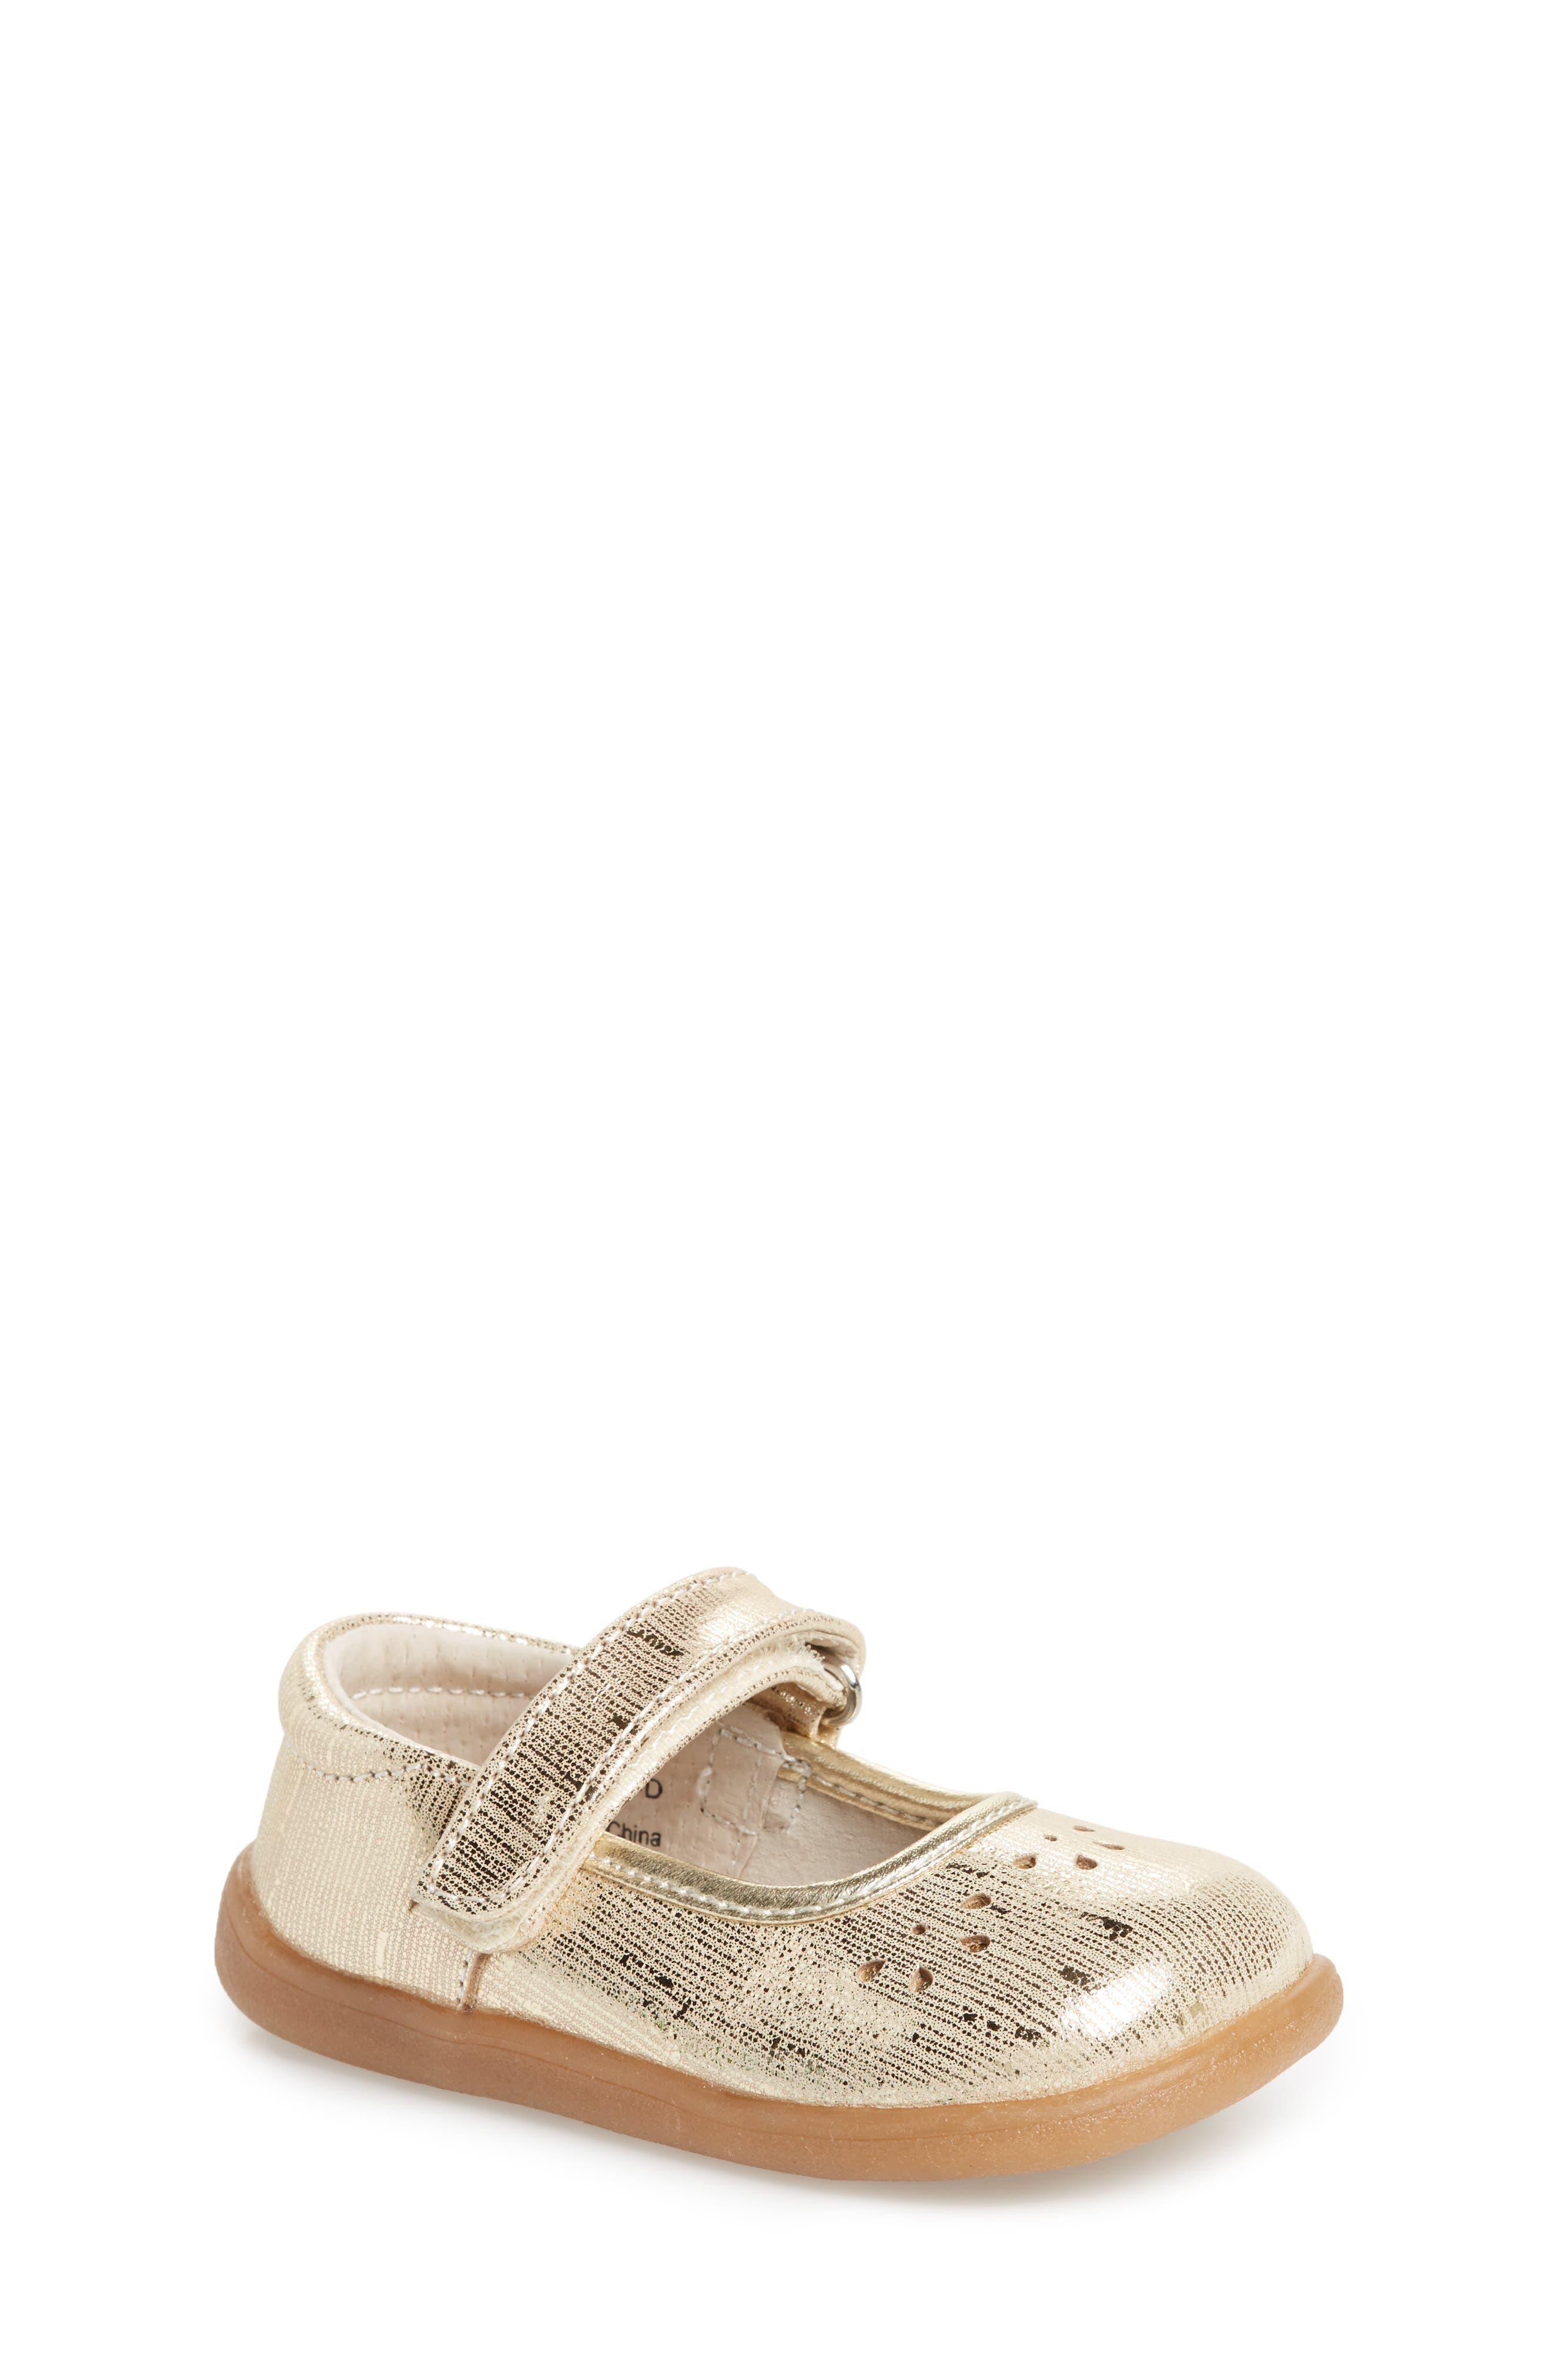 See Kai Run Ginger III Metallic Leather Mary Jane (Baby, Walker & Toddler)